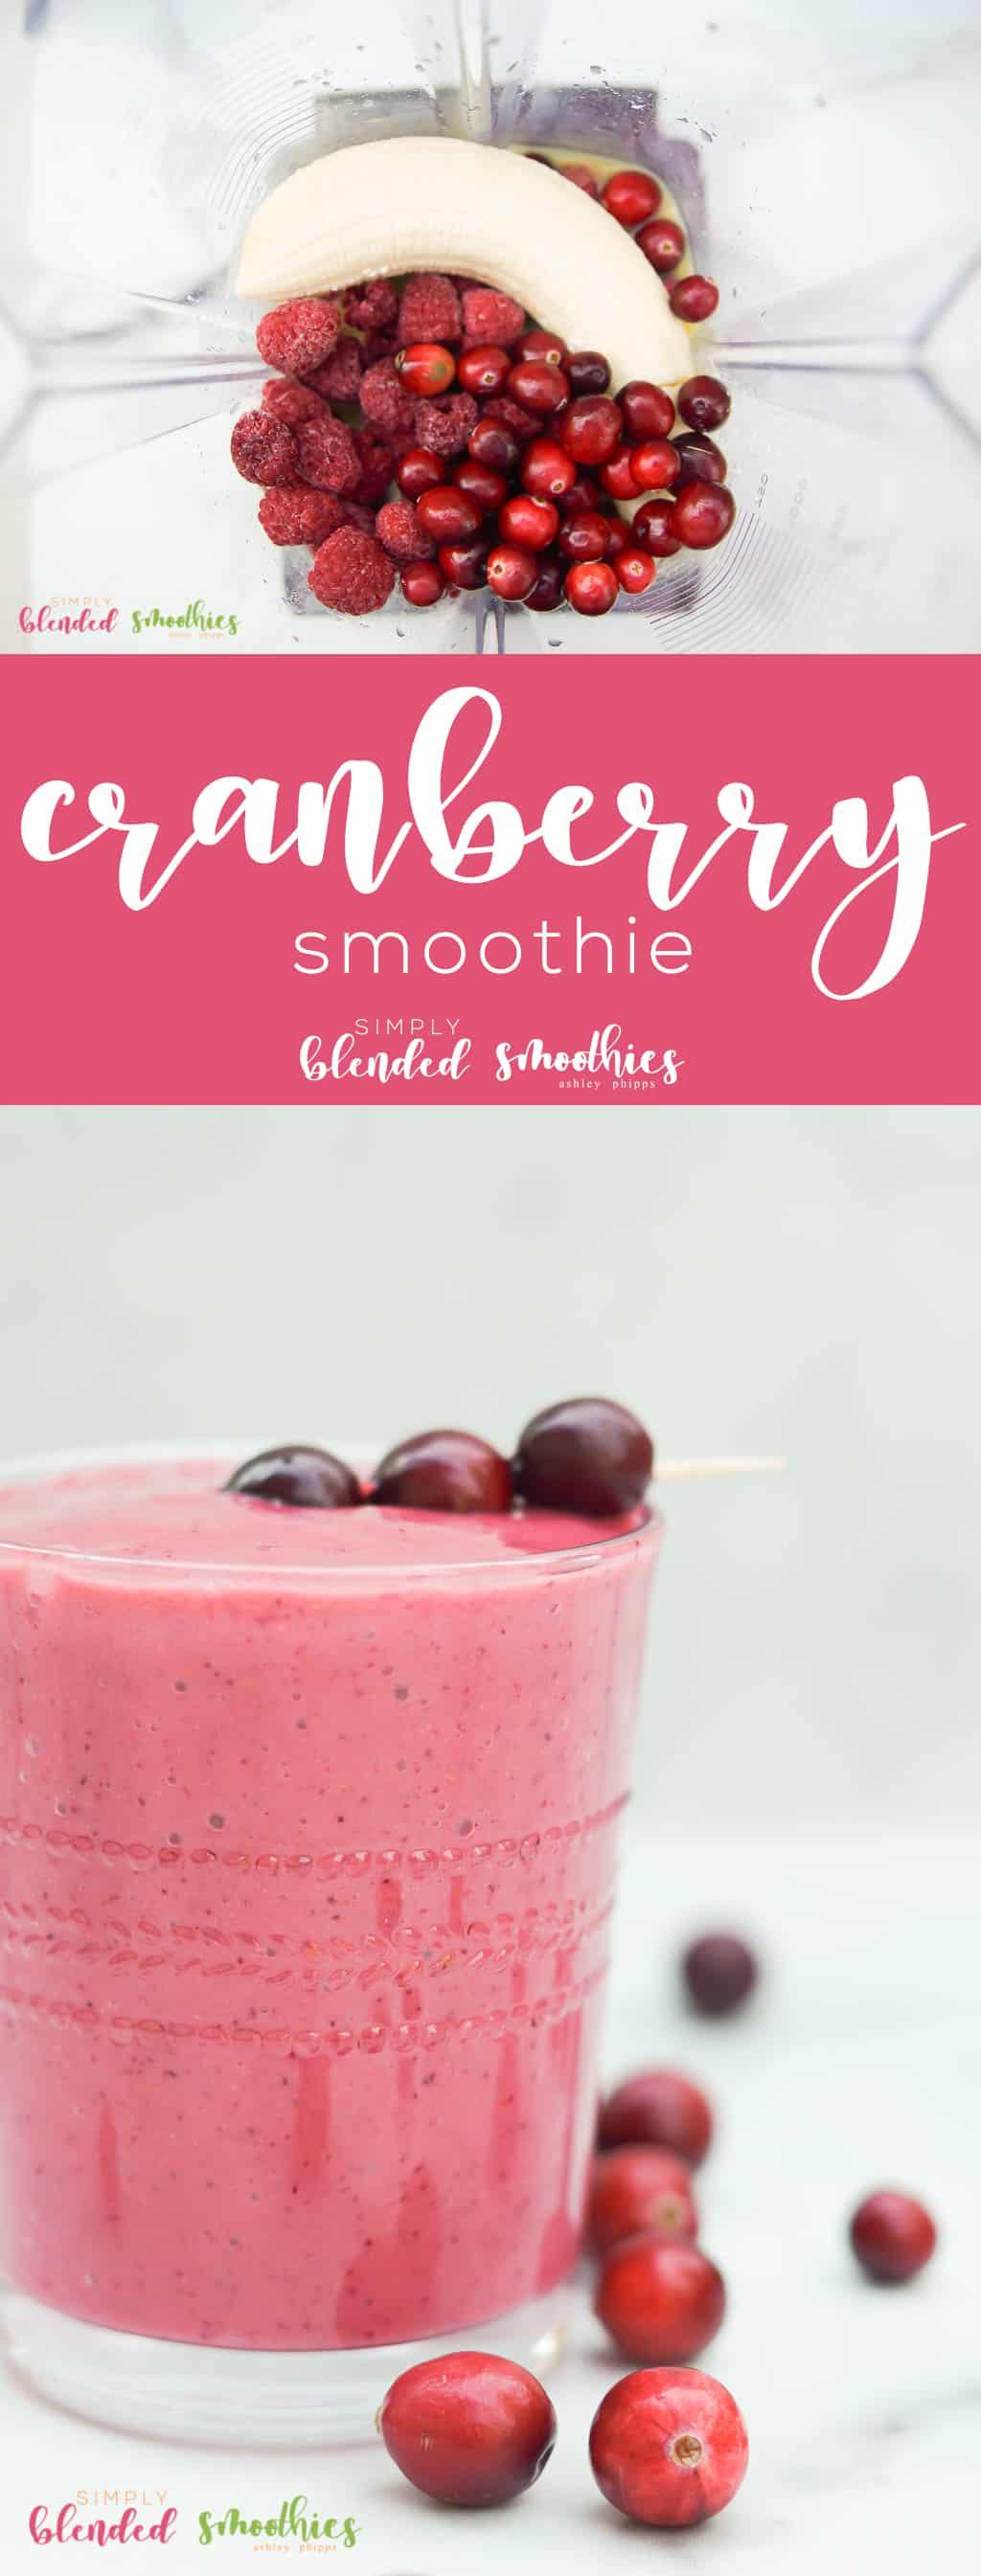 Cranberry Smoothie Recipe